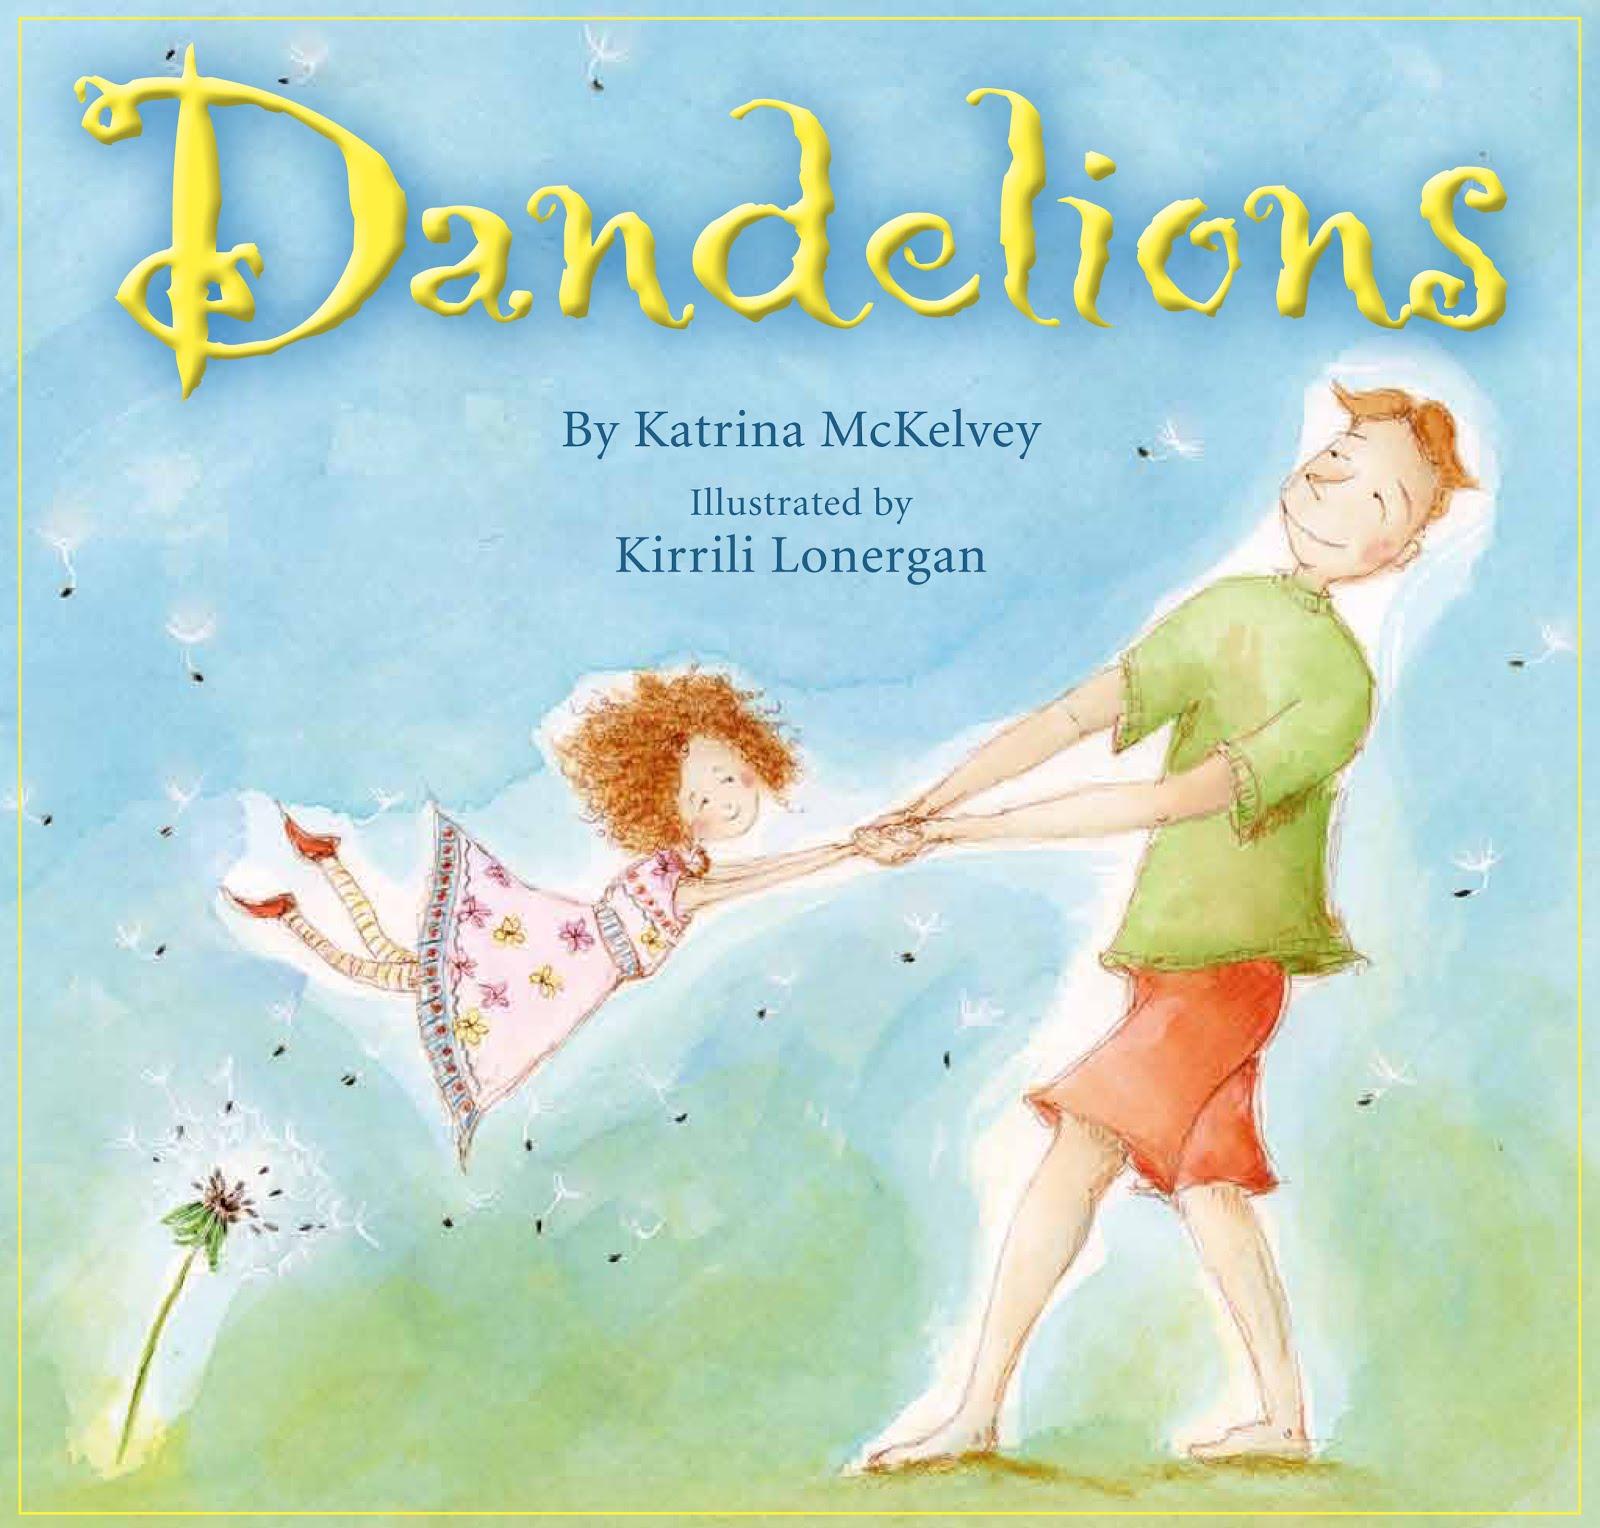 Dandelions by Katrina McKelvey and Kirrili Lonergan